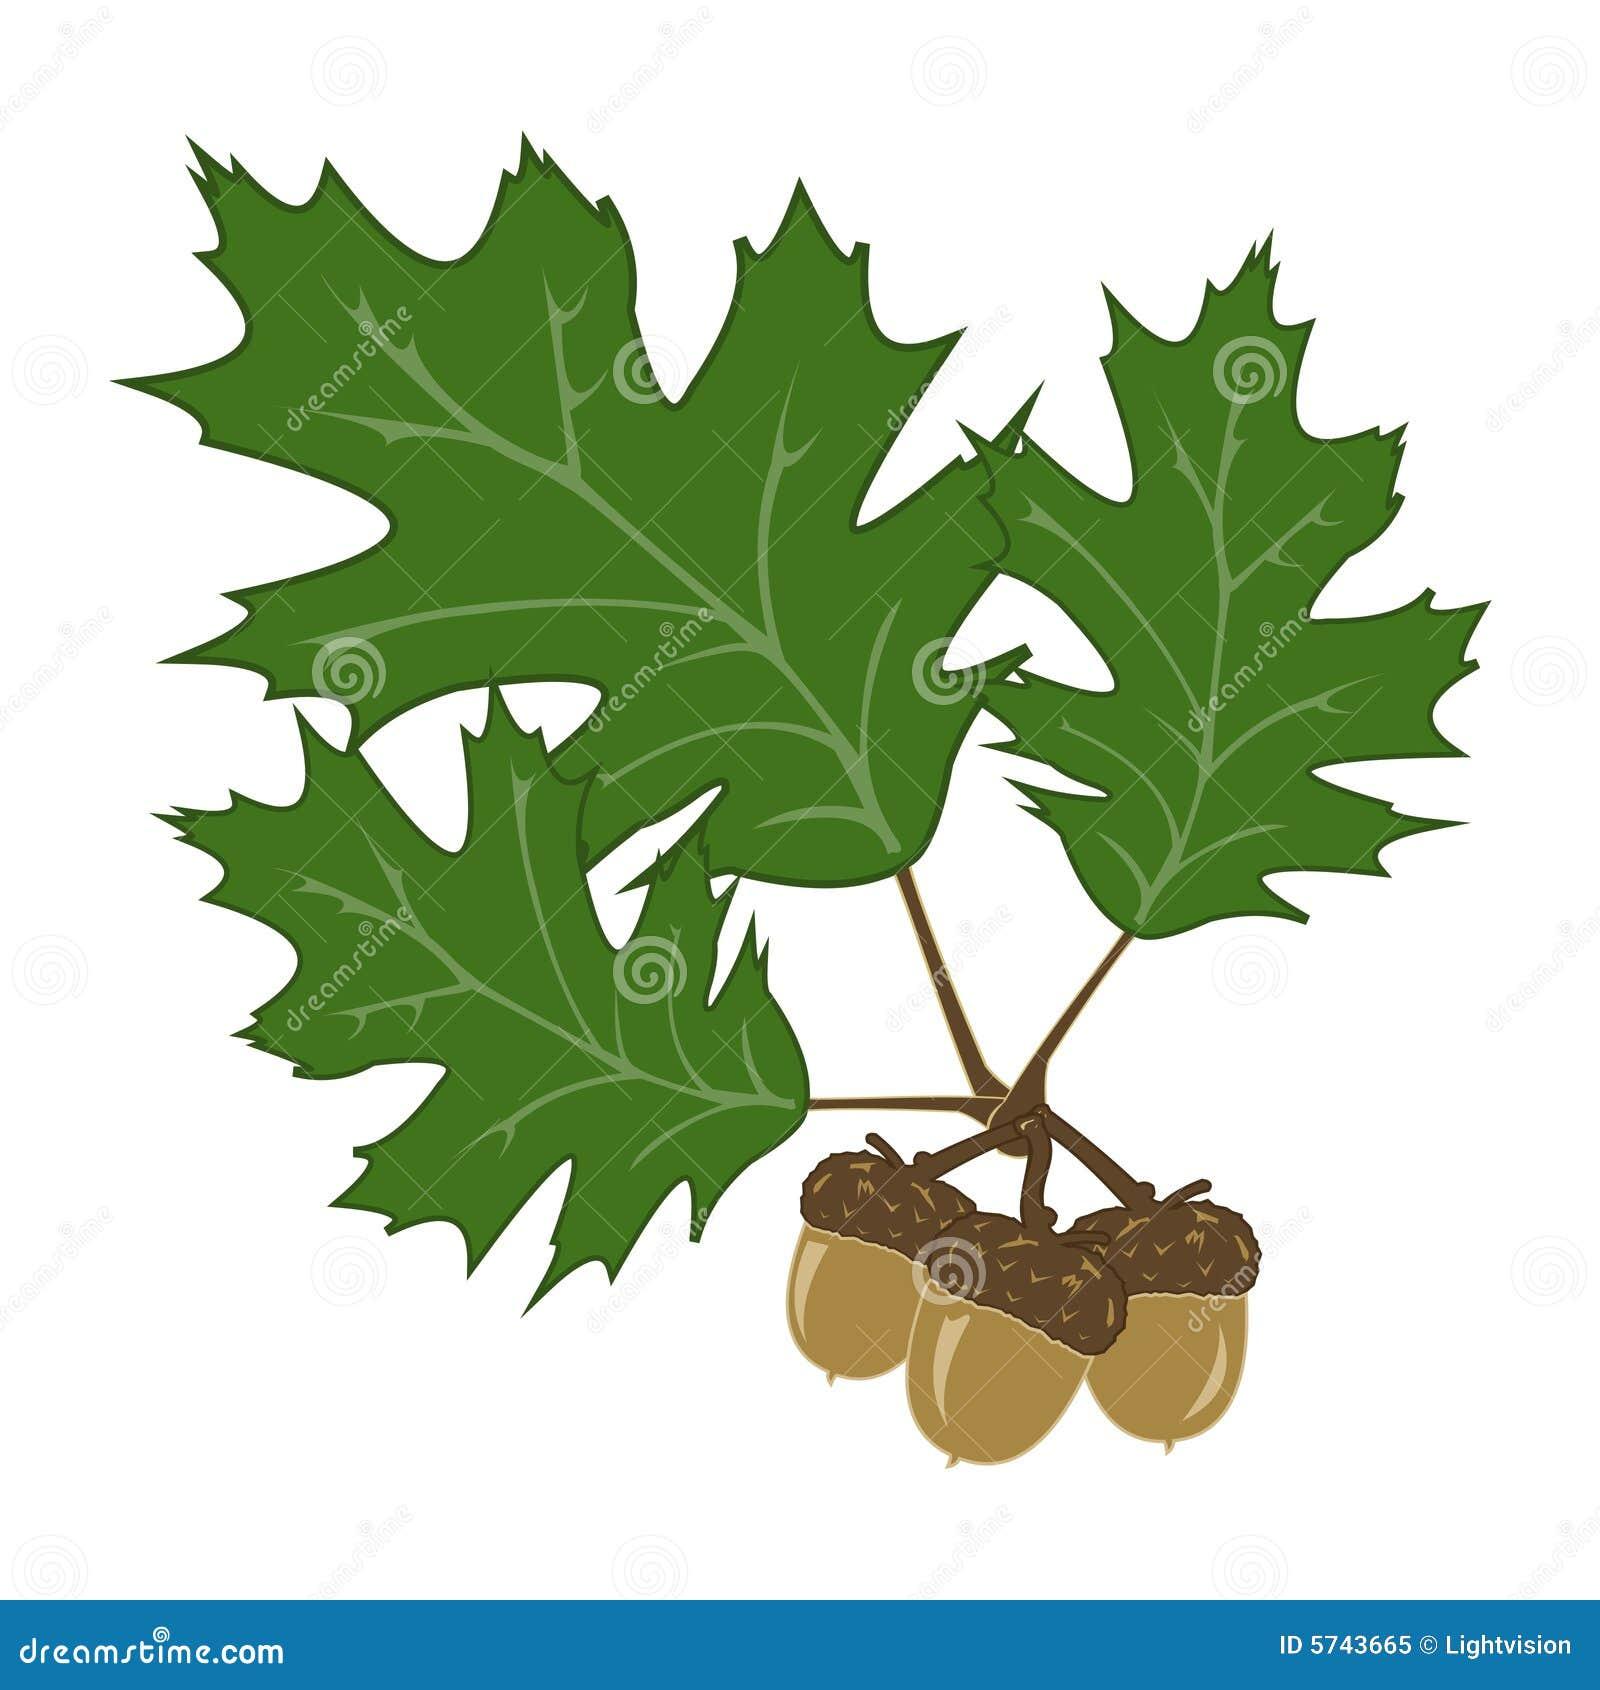 Acorn And Leaf Illustration Royalty Free Stock Photo